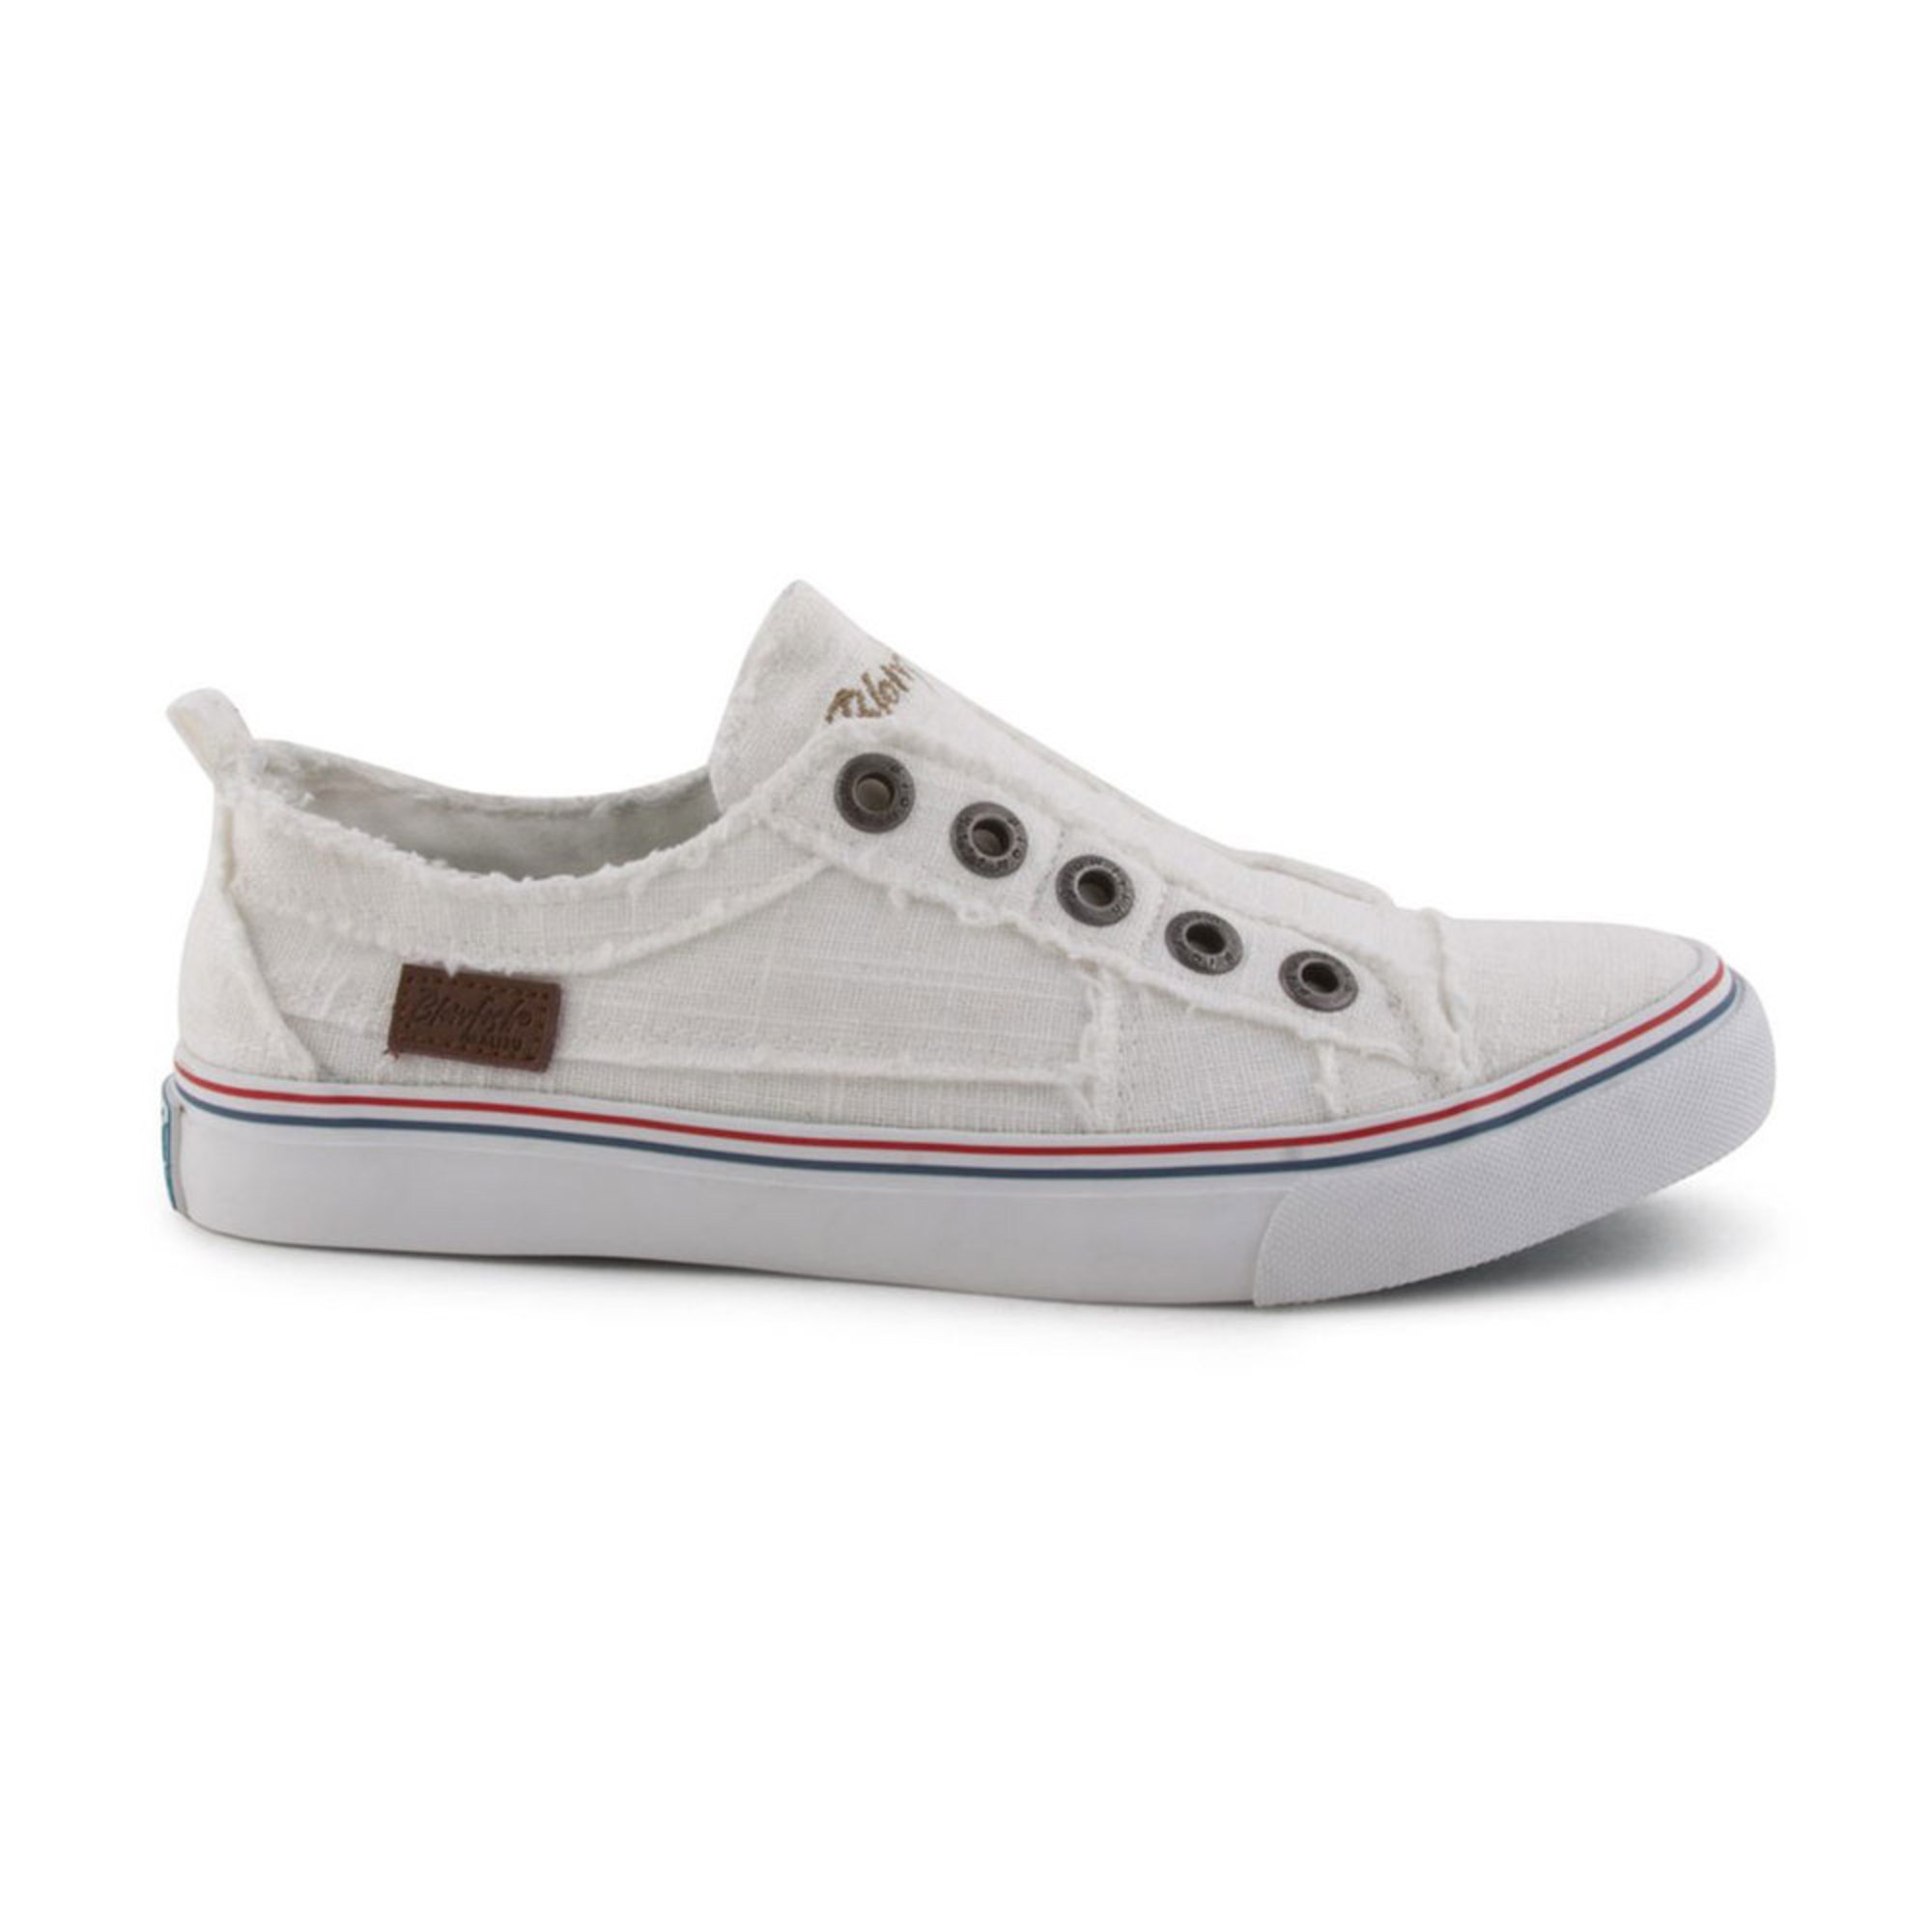 610ec5cff99 Blowfish. Blowfish Women s Play Sneaker No Laces